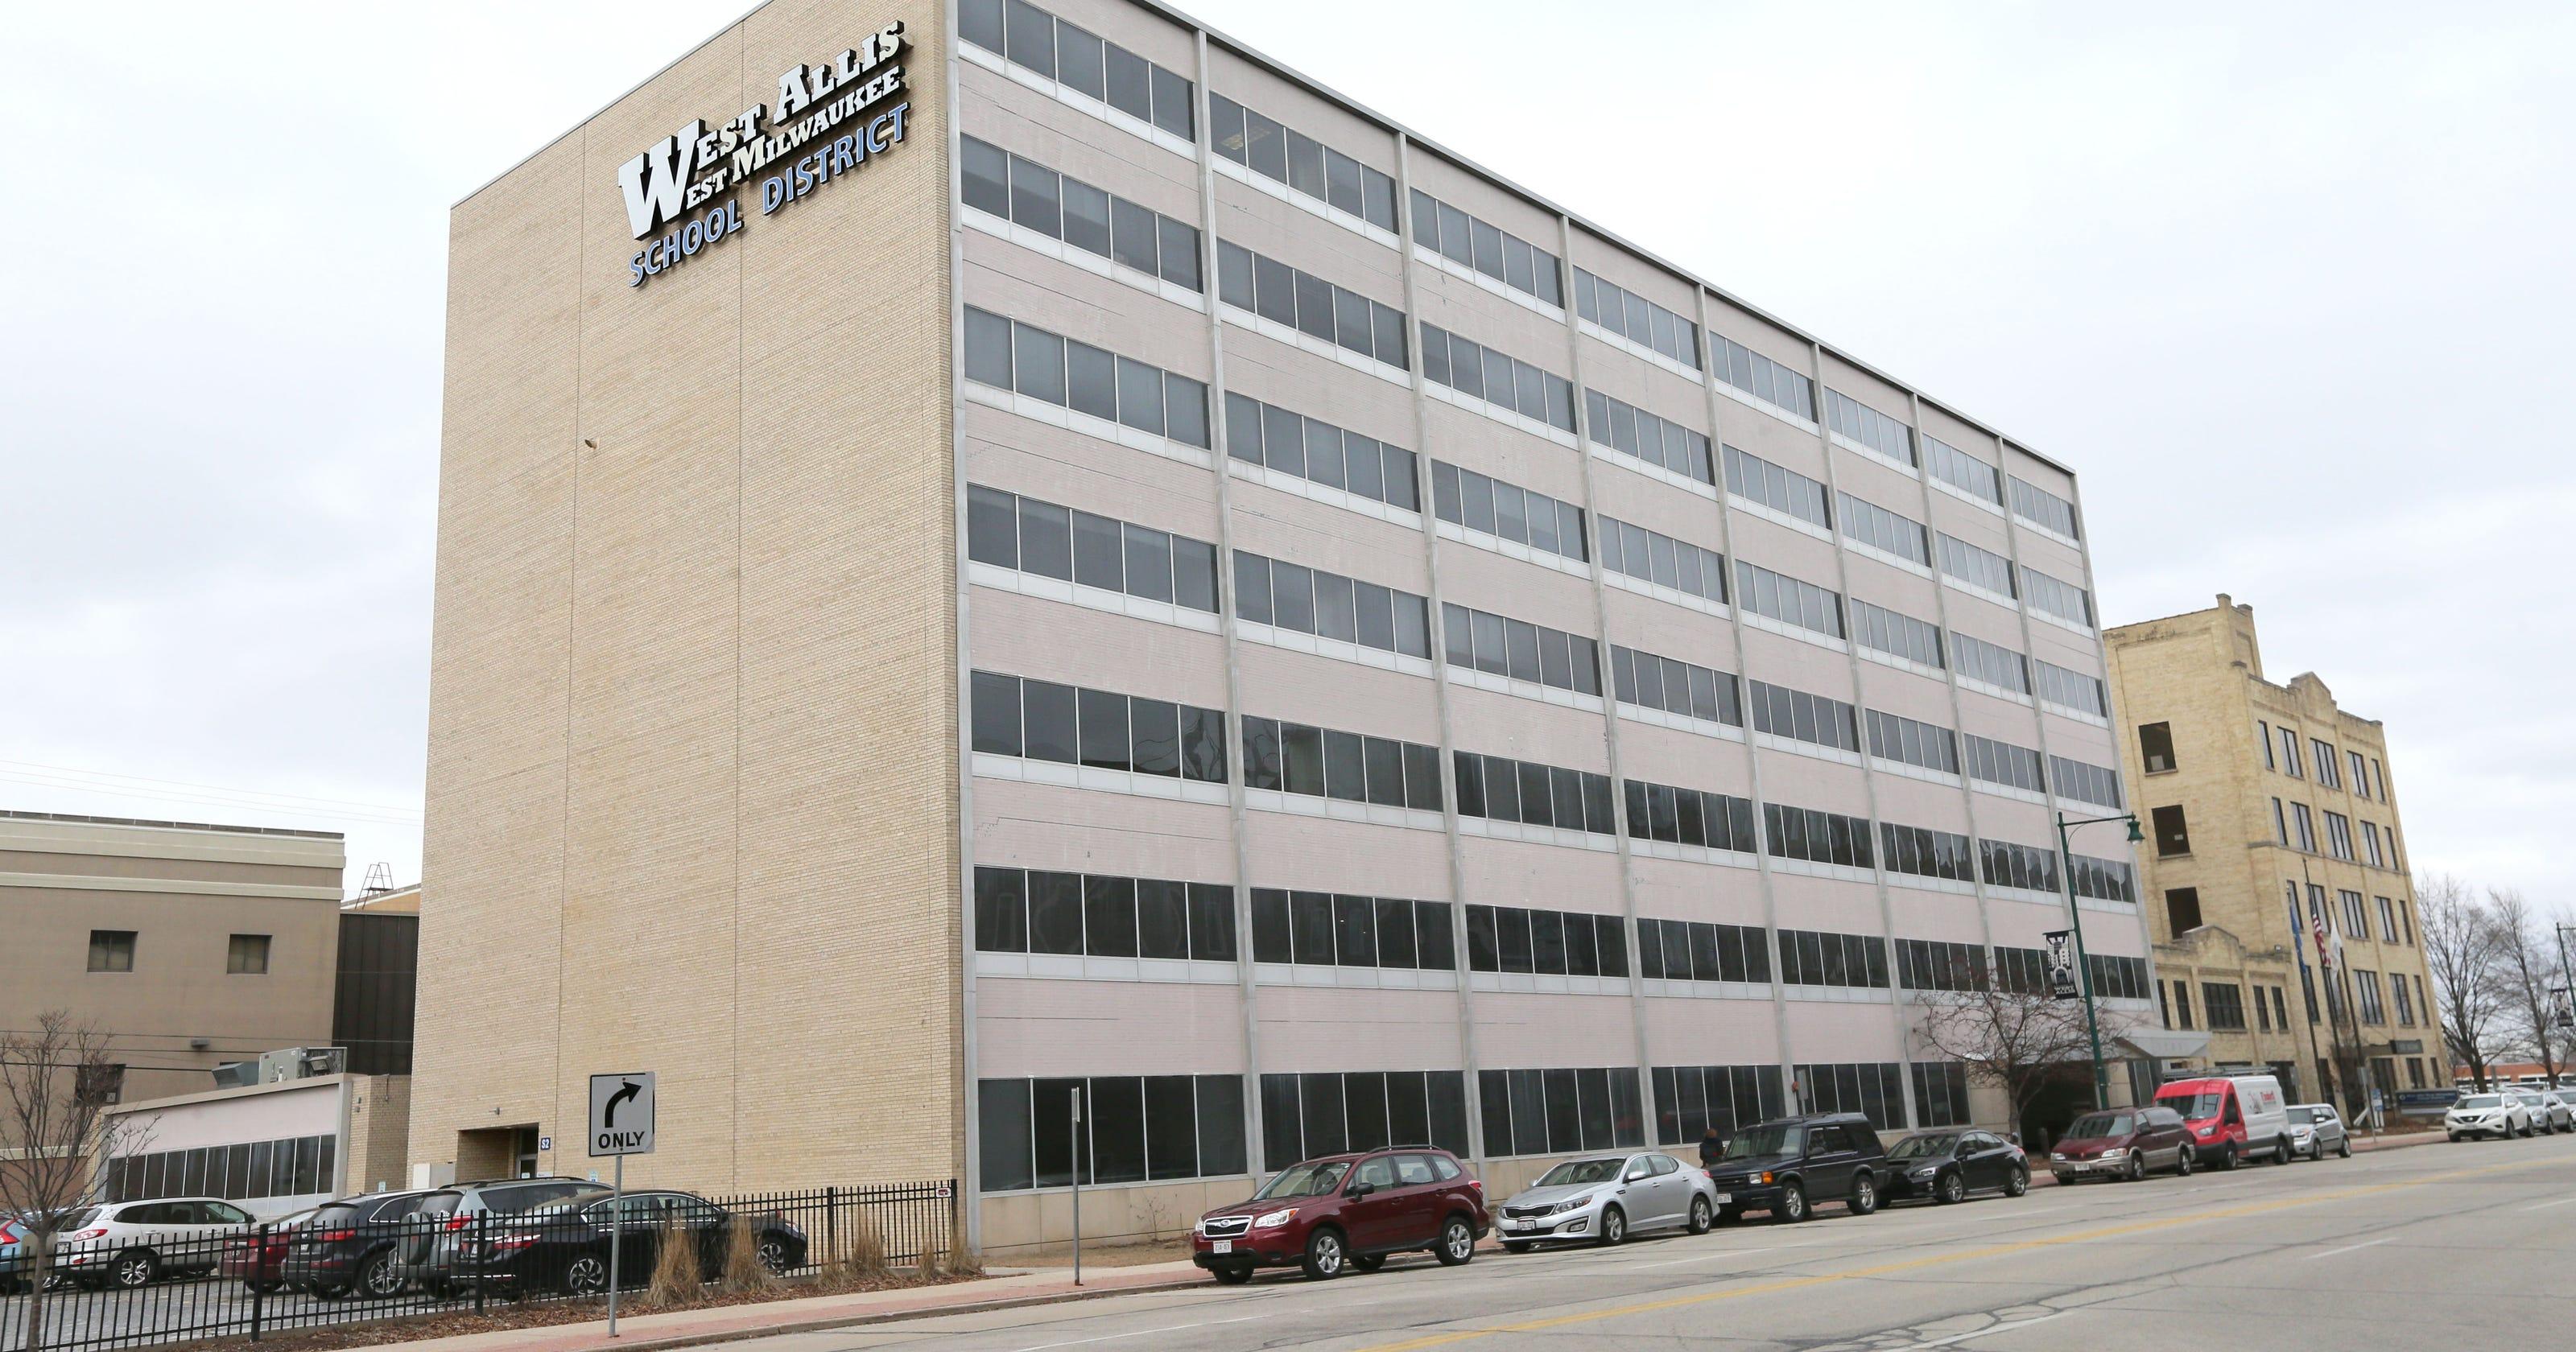 School district blows through $17.5 million in reserves |West Allis Sign